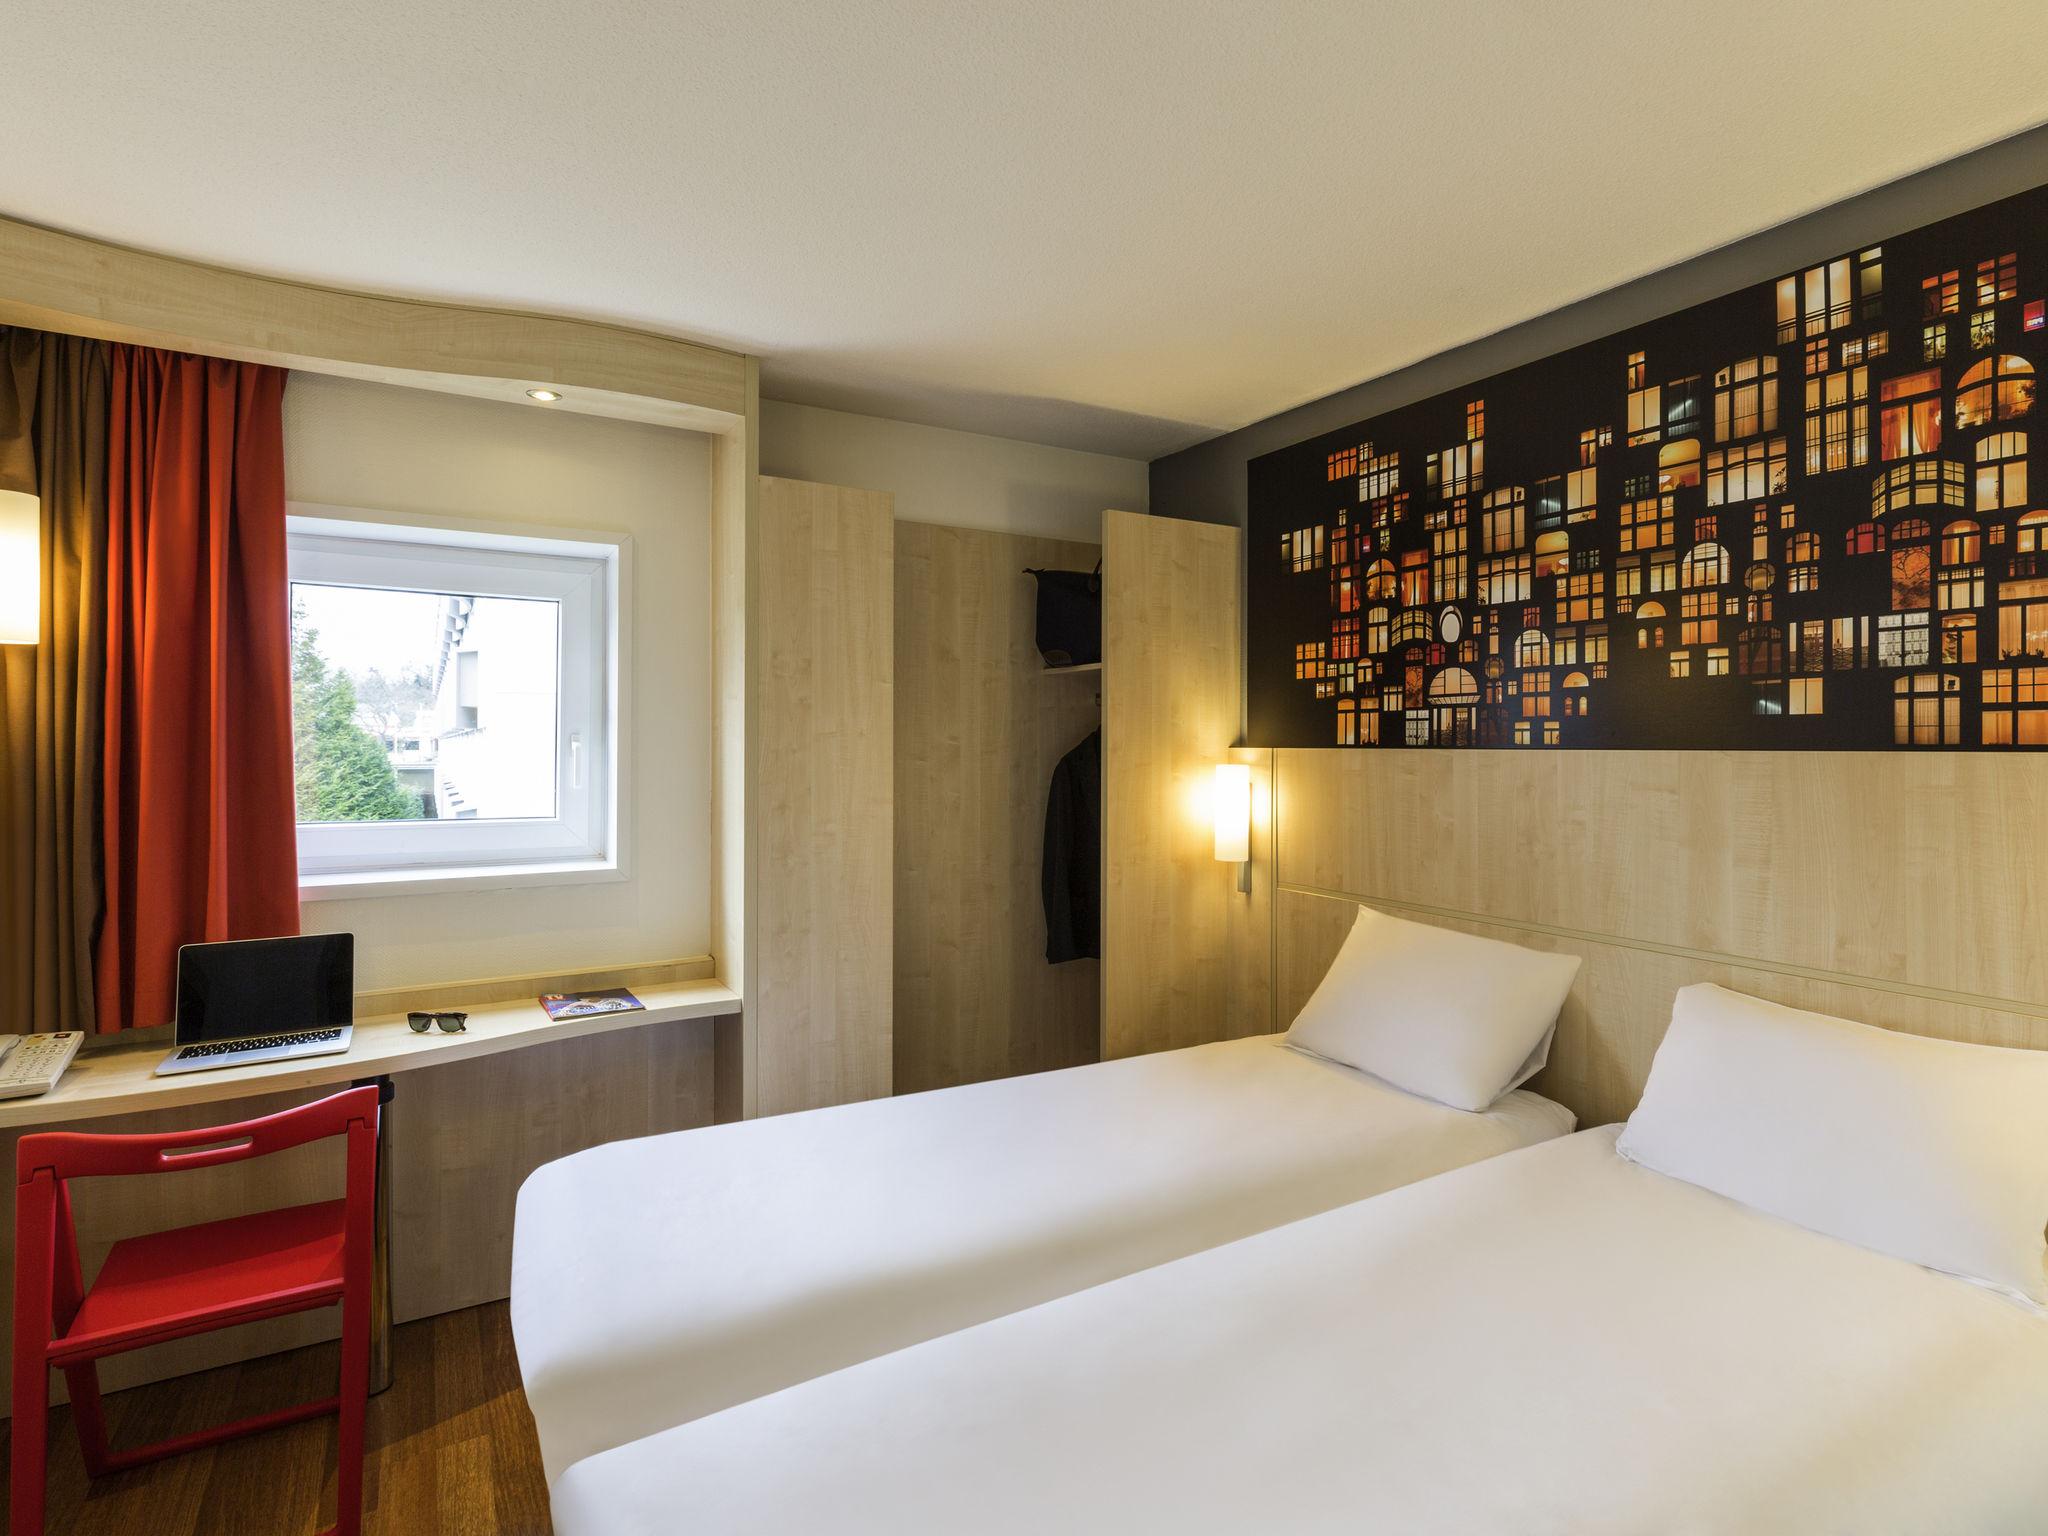 Hotel Ibis Aulnay Paris Nord Expo Aulnay Sous Bois